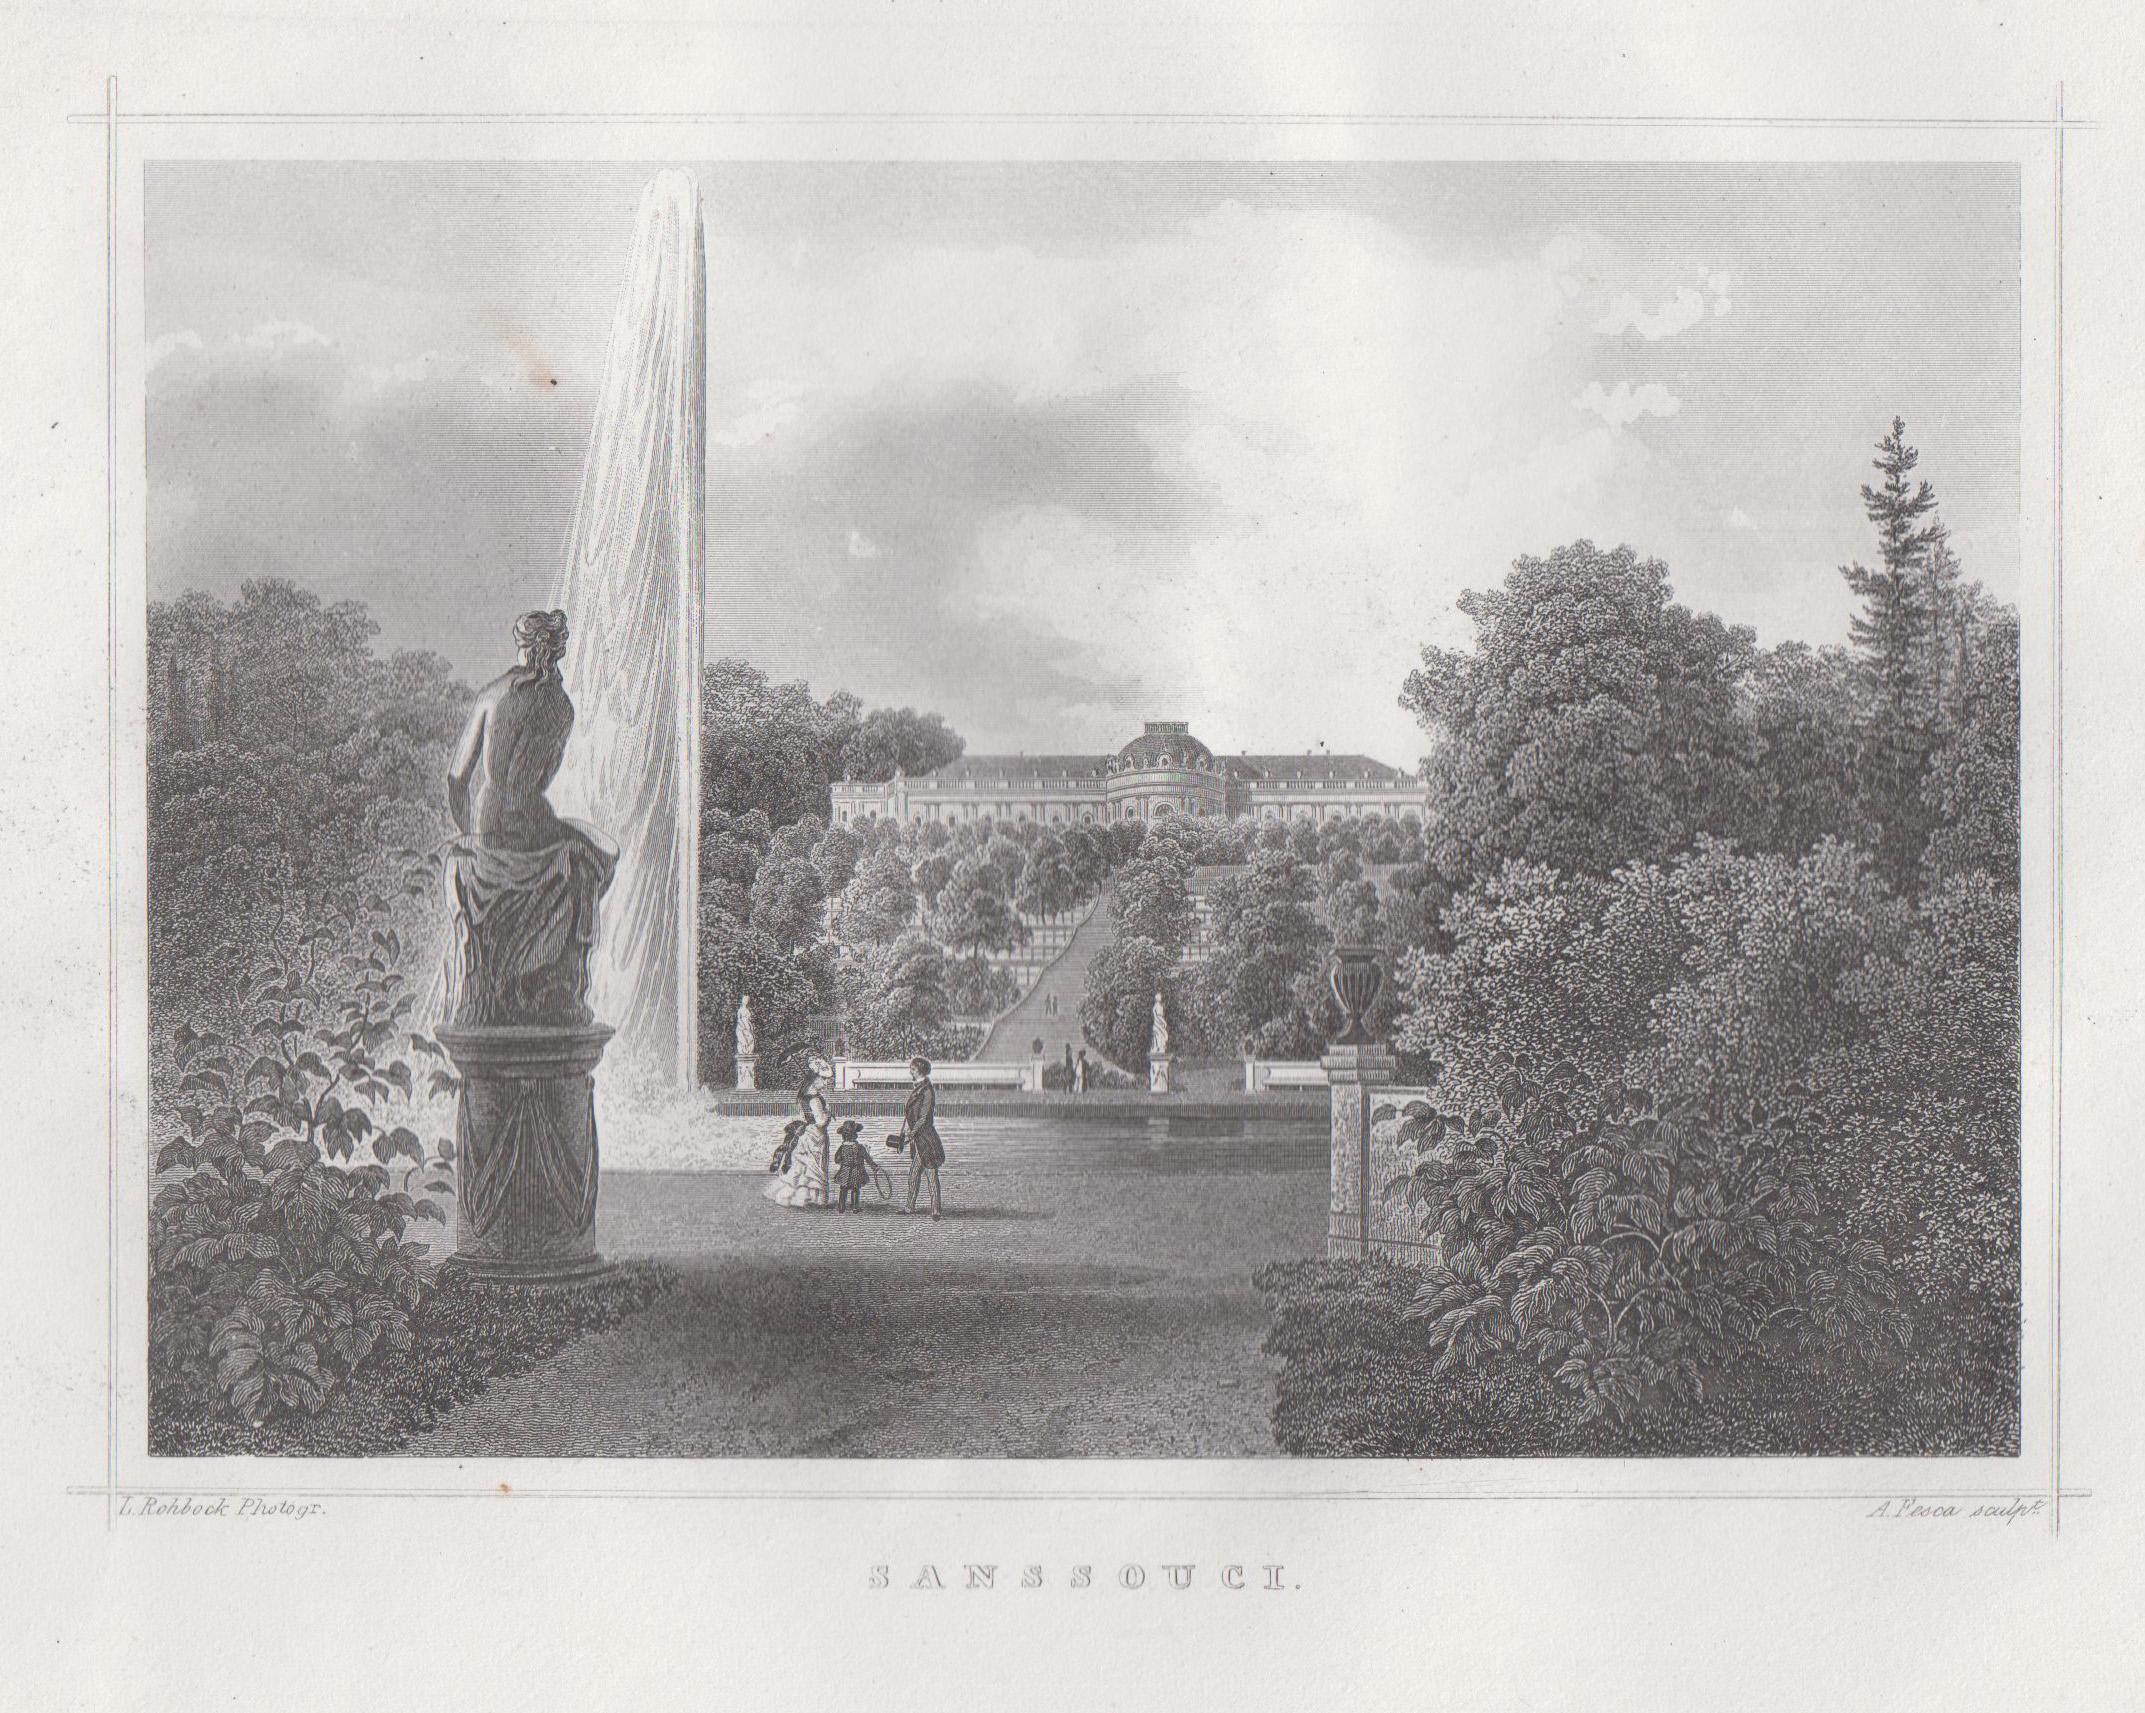 Ansicht m. d. Terrassen, i. Vgr. die: Potsdam - Schloss